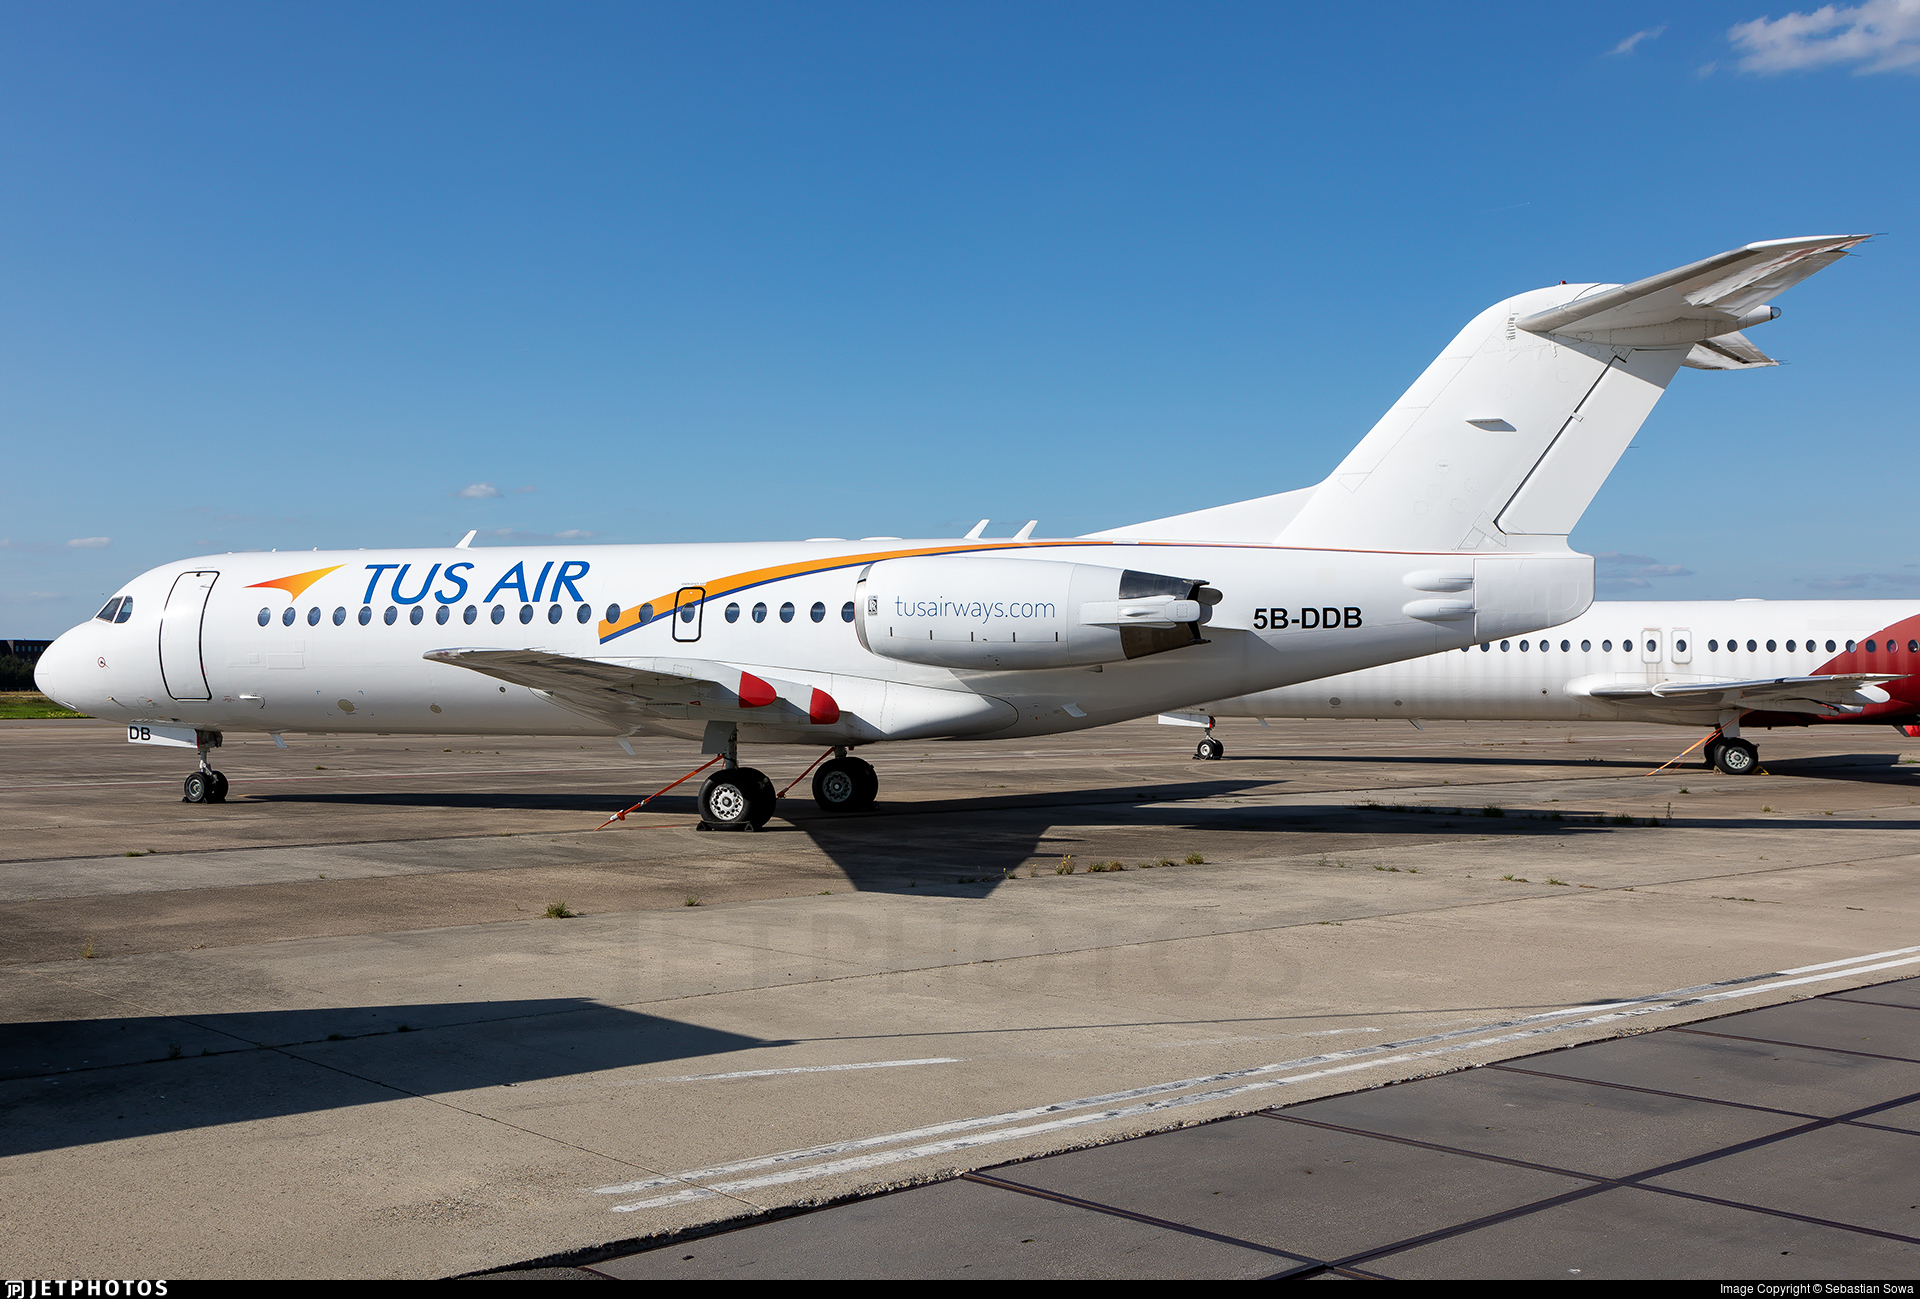 5B-DDB - Fokker 70 - Tus Airways